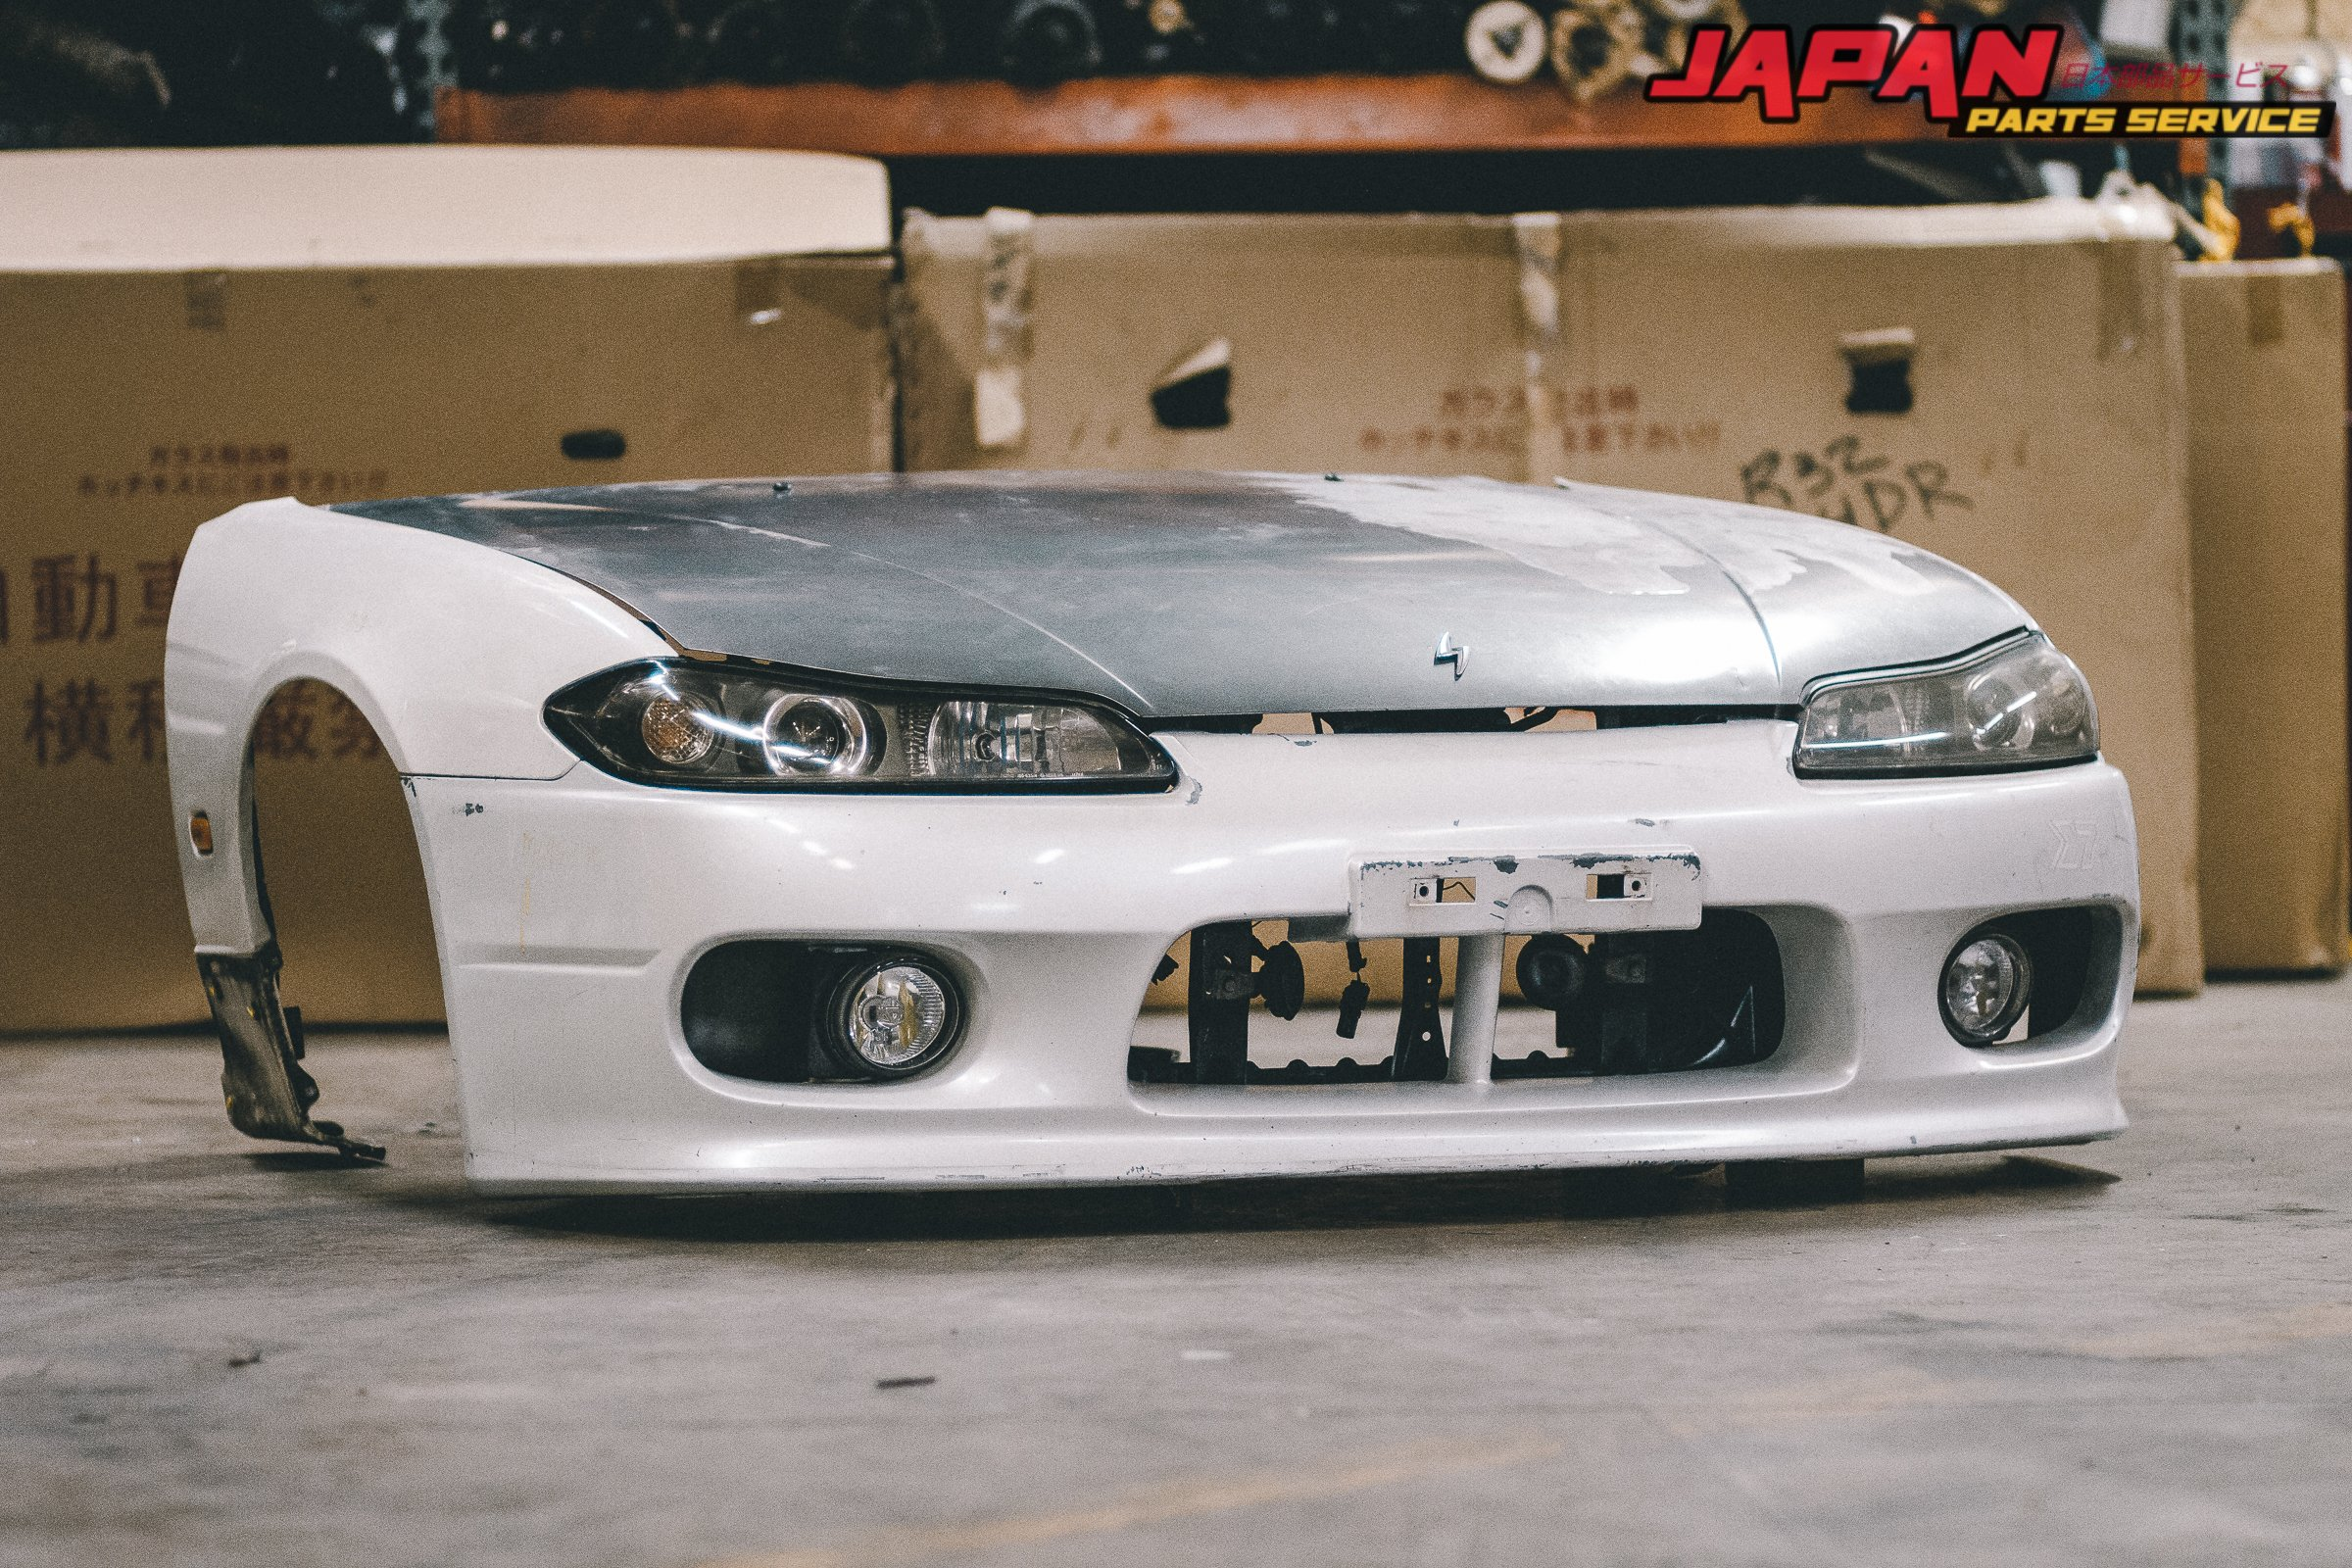 Nissan Silvia VII (S15) 1999 - 2002 Coupe #4